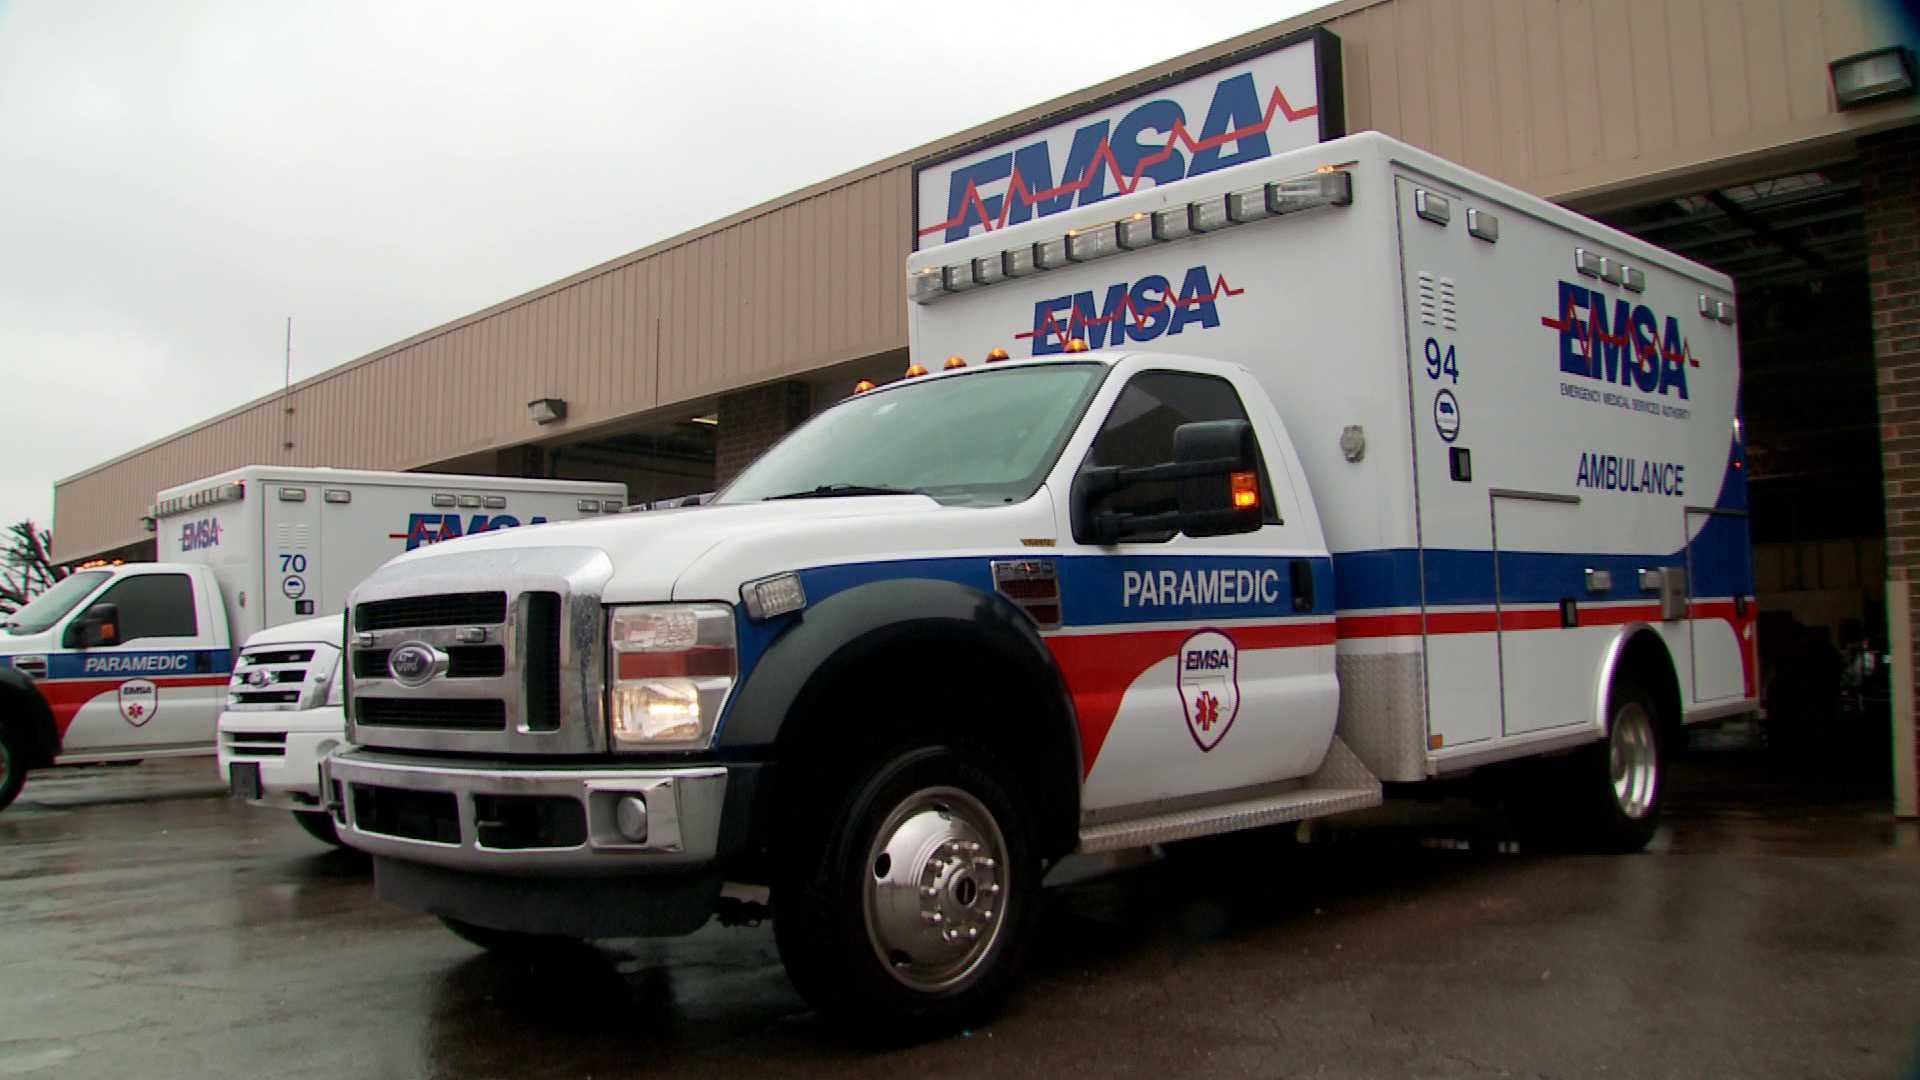 EMSA trucks exit parking bay at headquarters